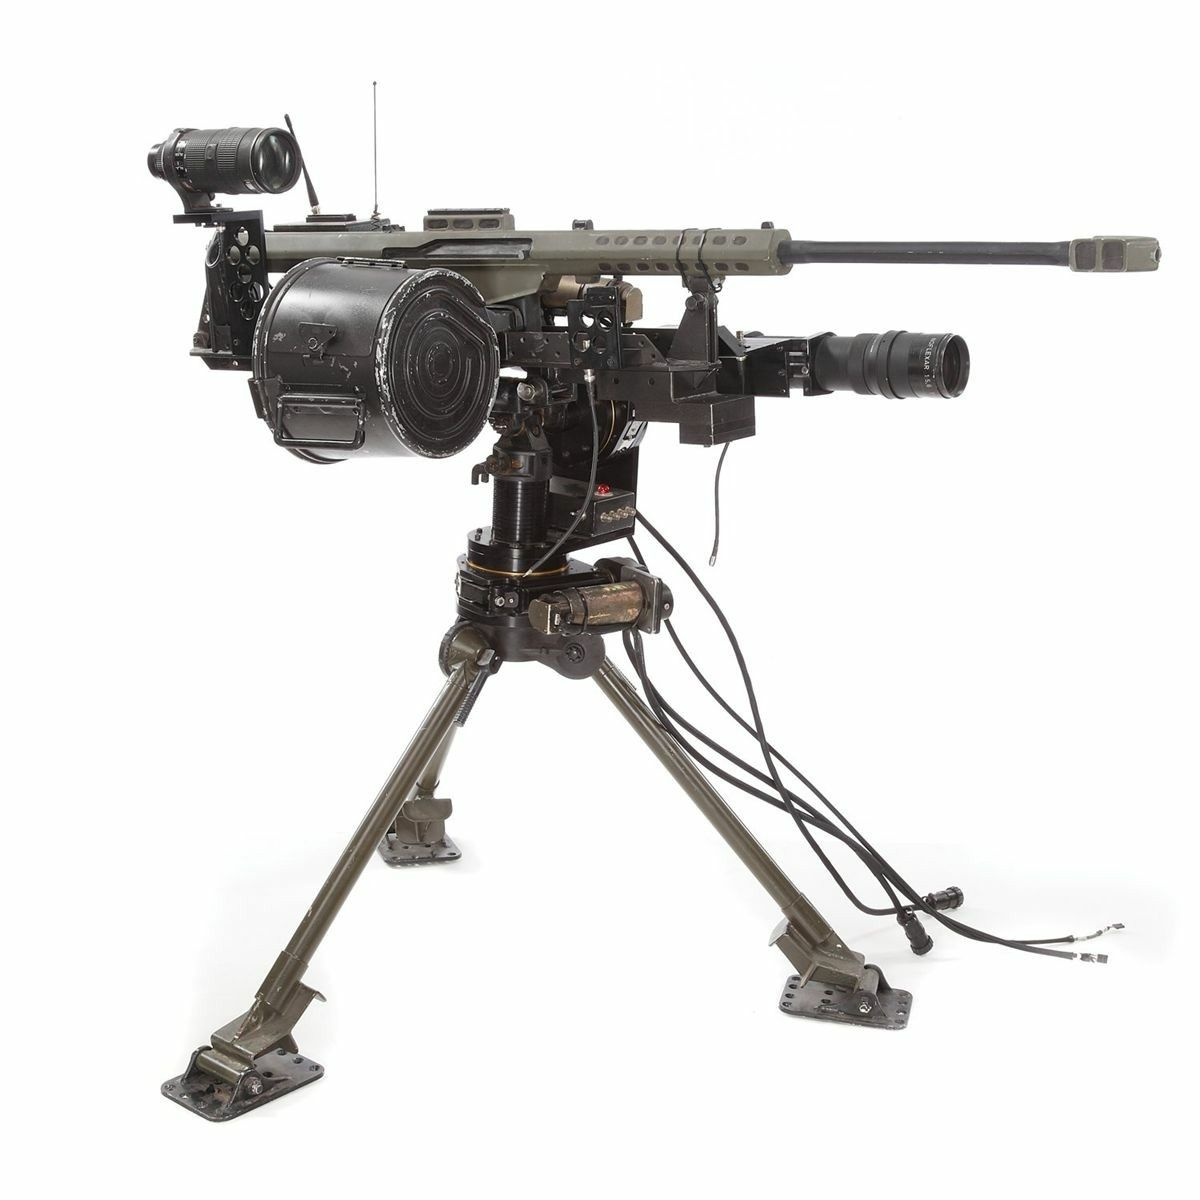 Sentry Gun | KES7REL | Pinterest | Guns, Weapons and Firearms